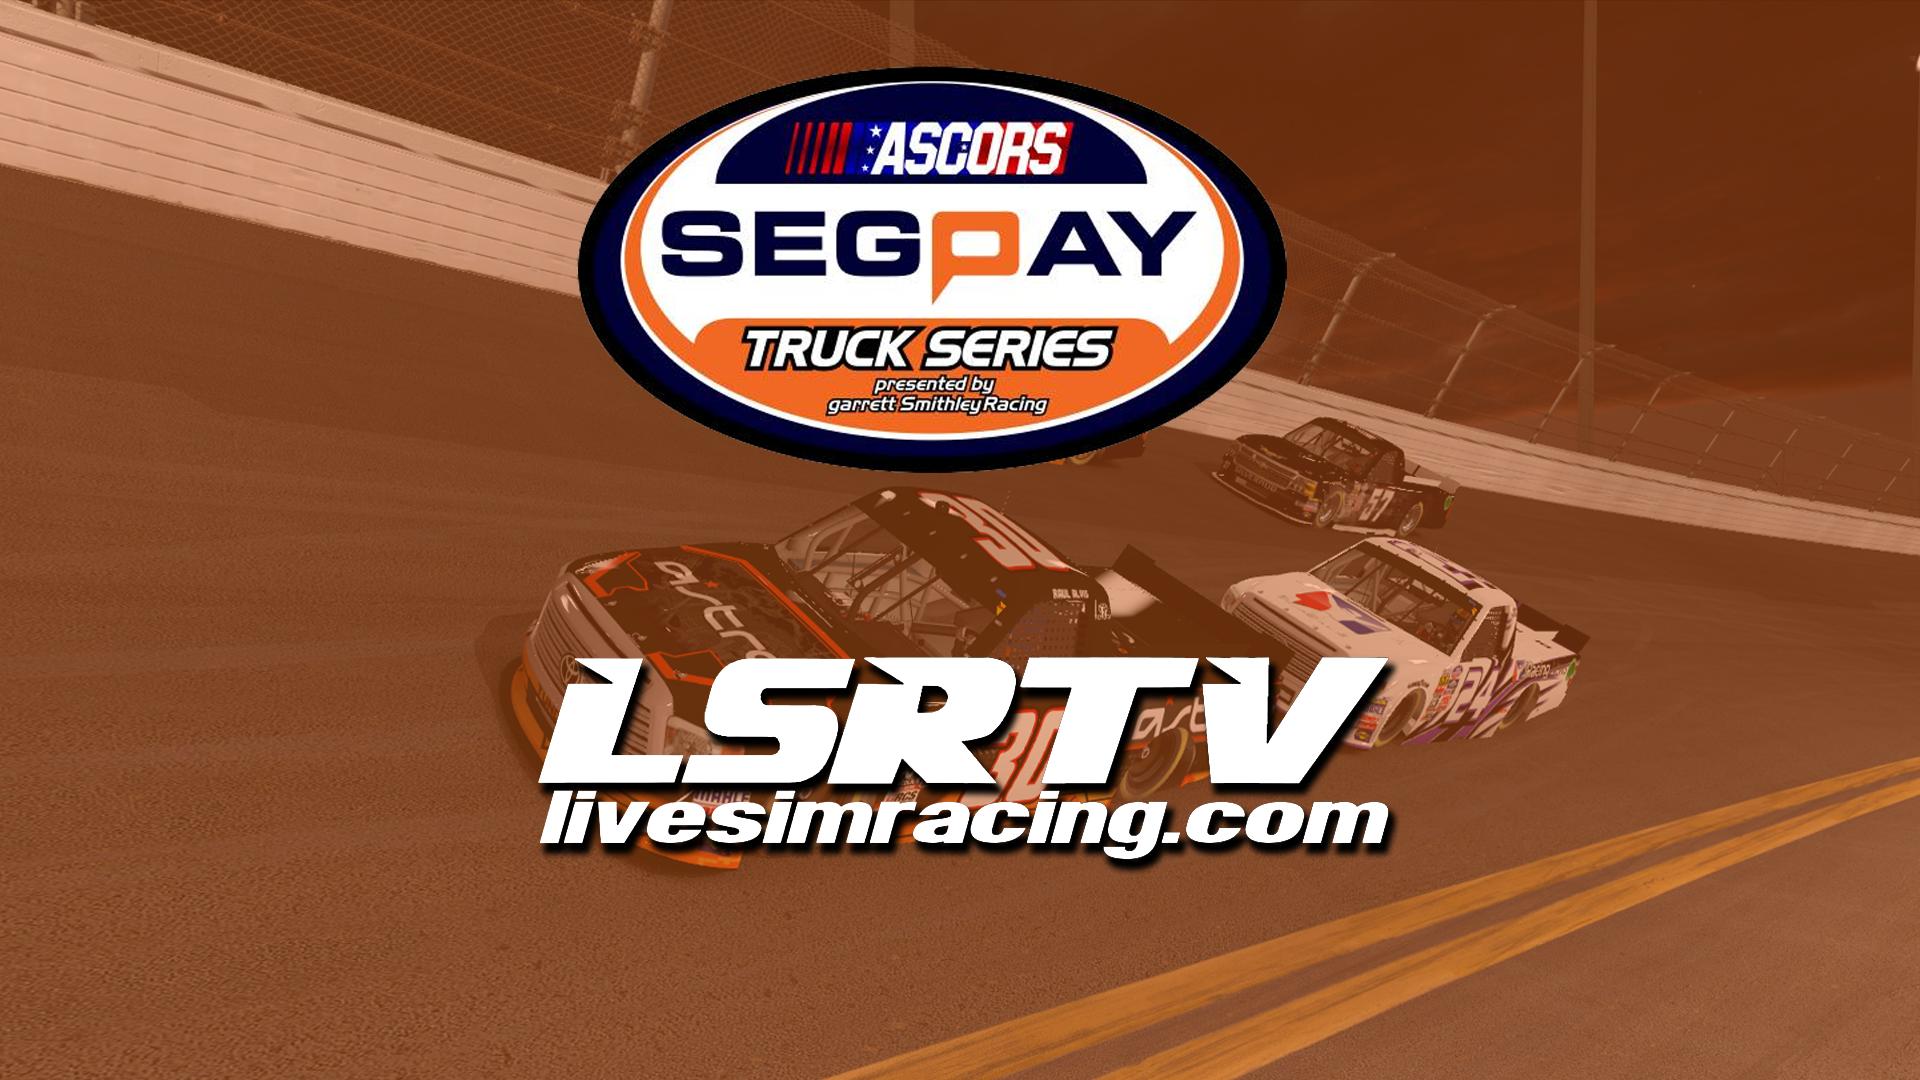 ASCORS SegPay Truck Series